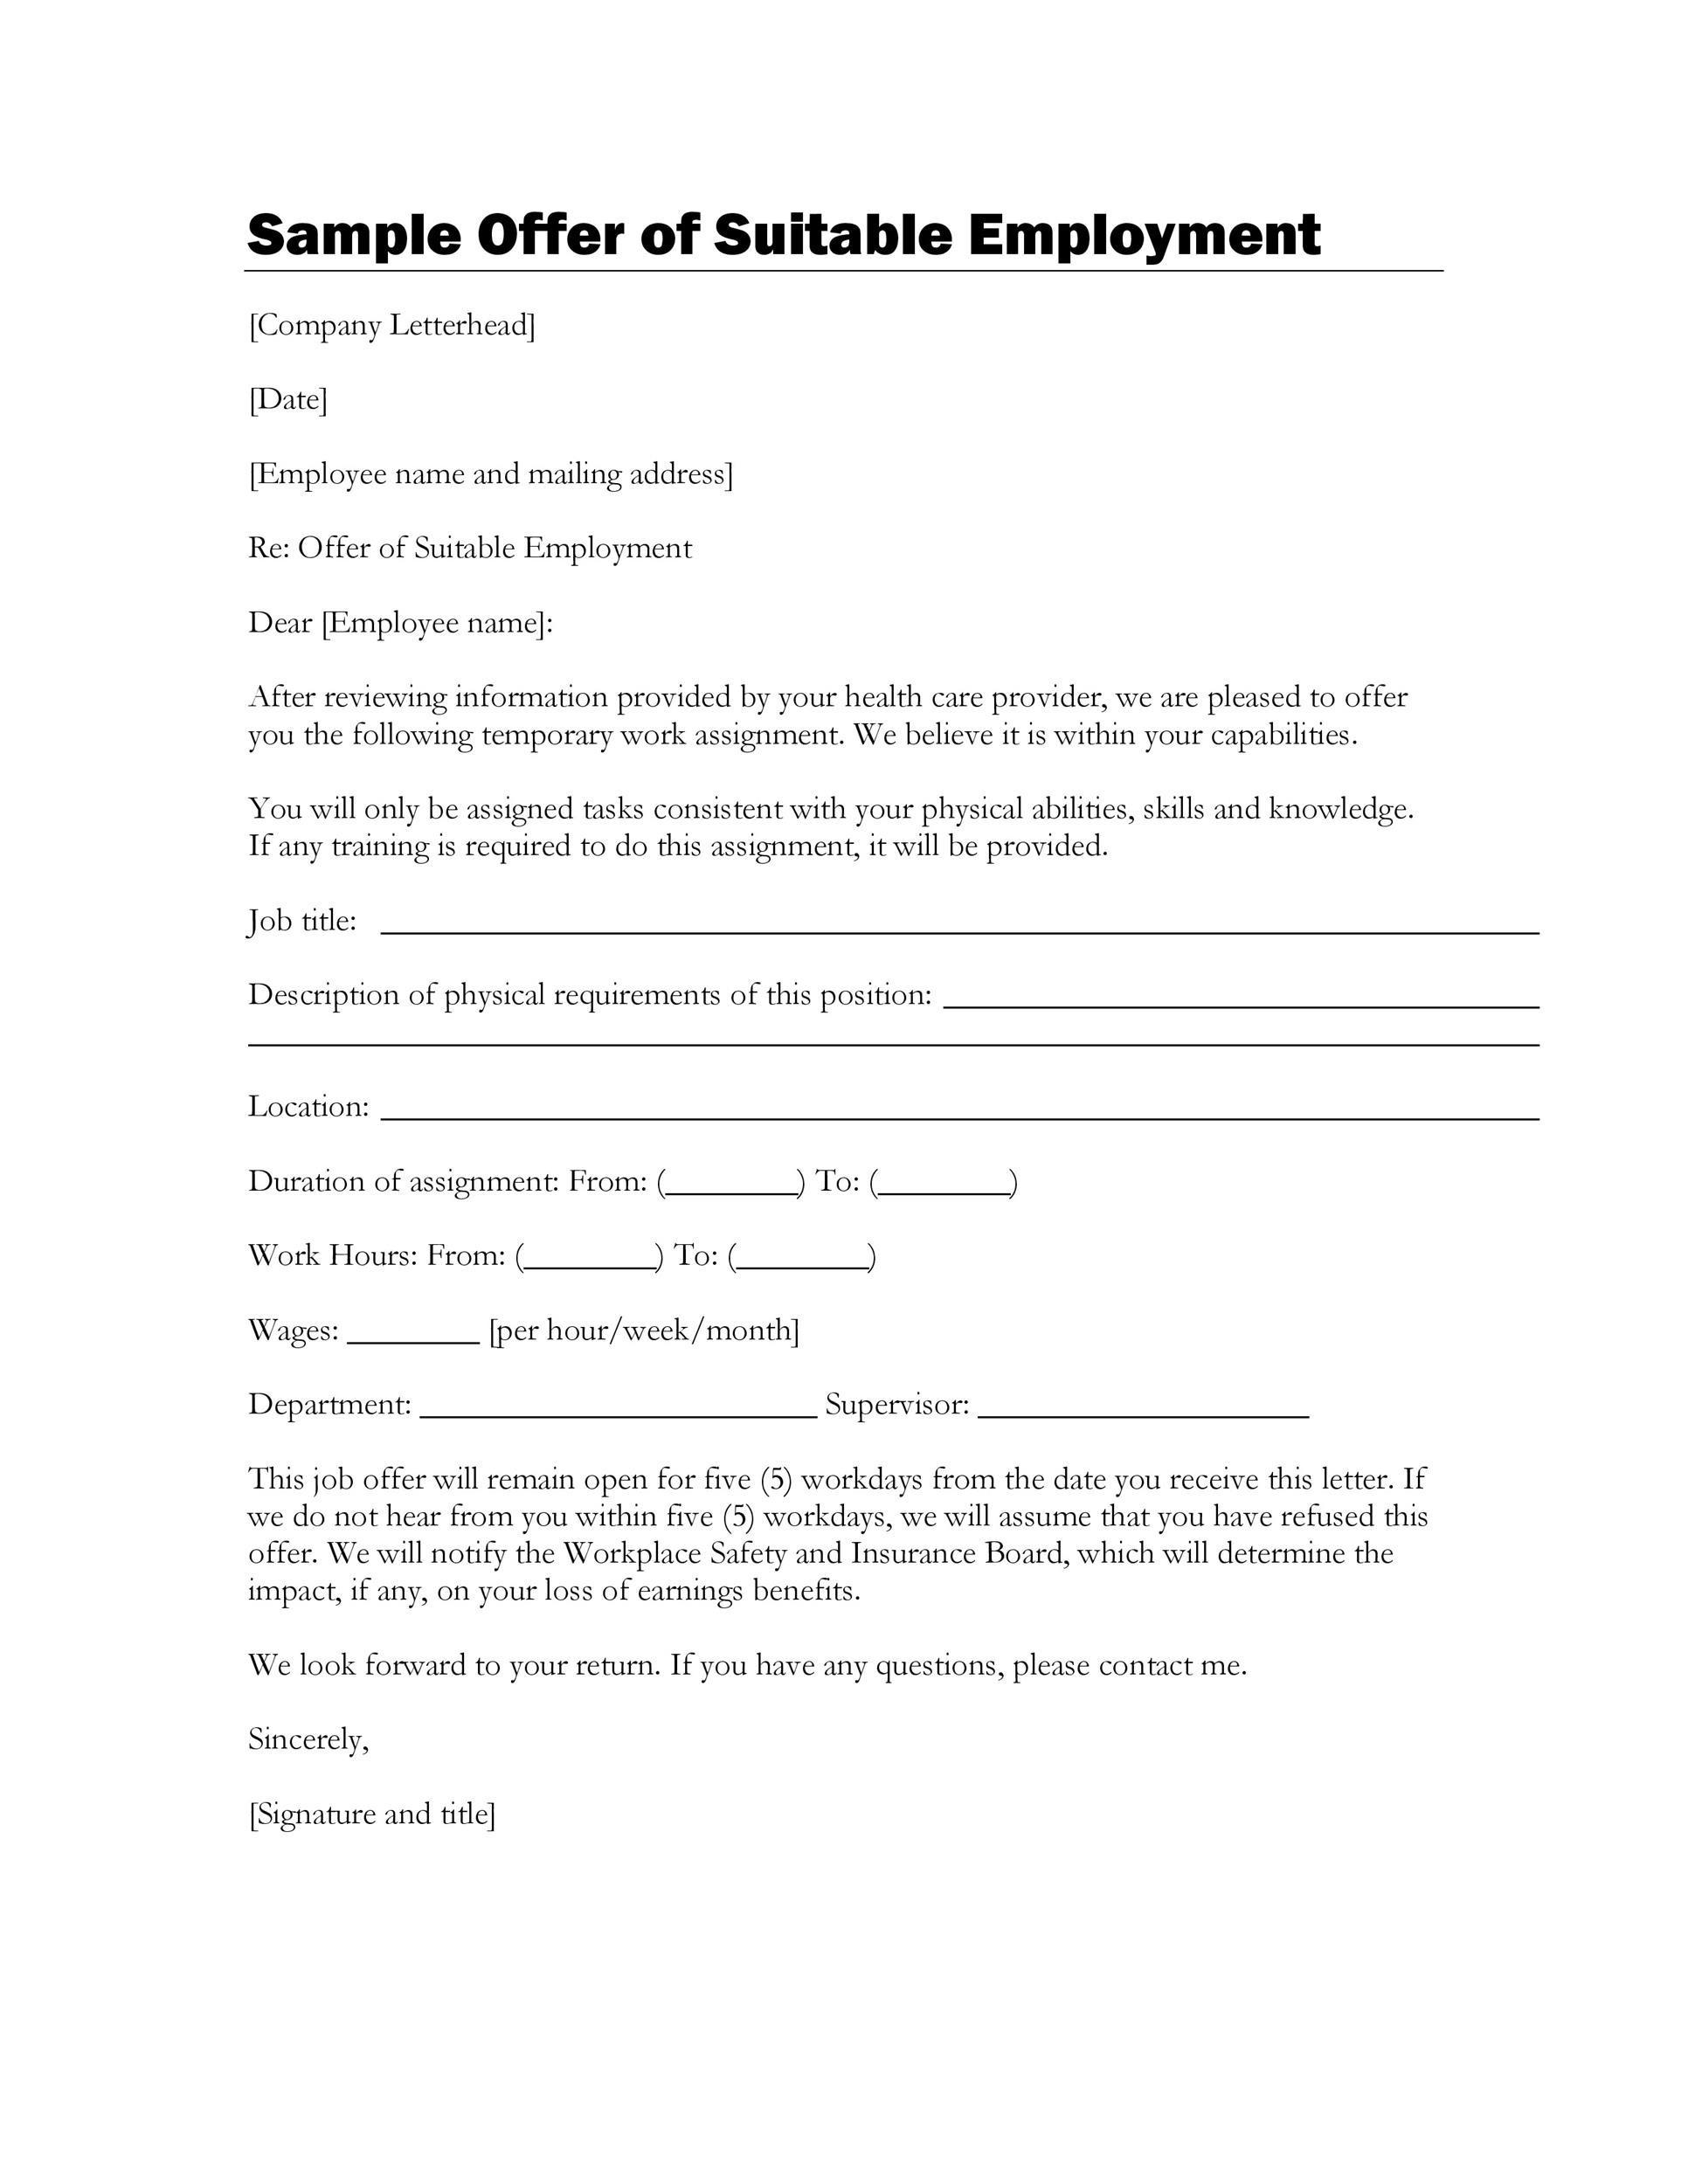 Free Offer letter 40